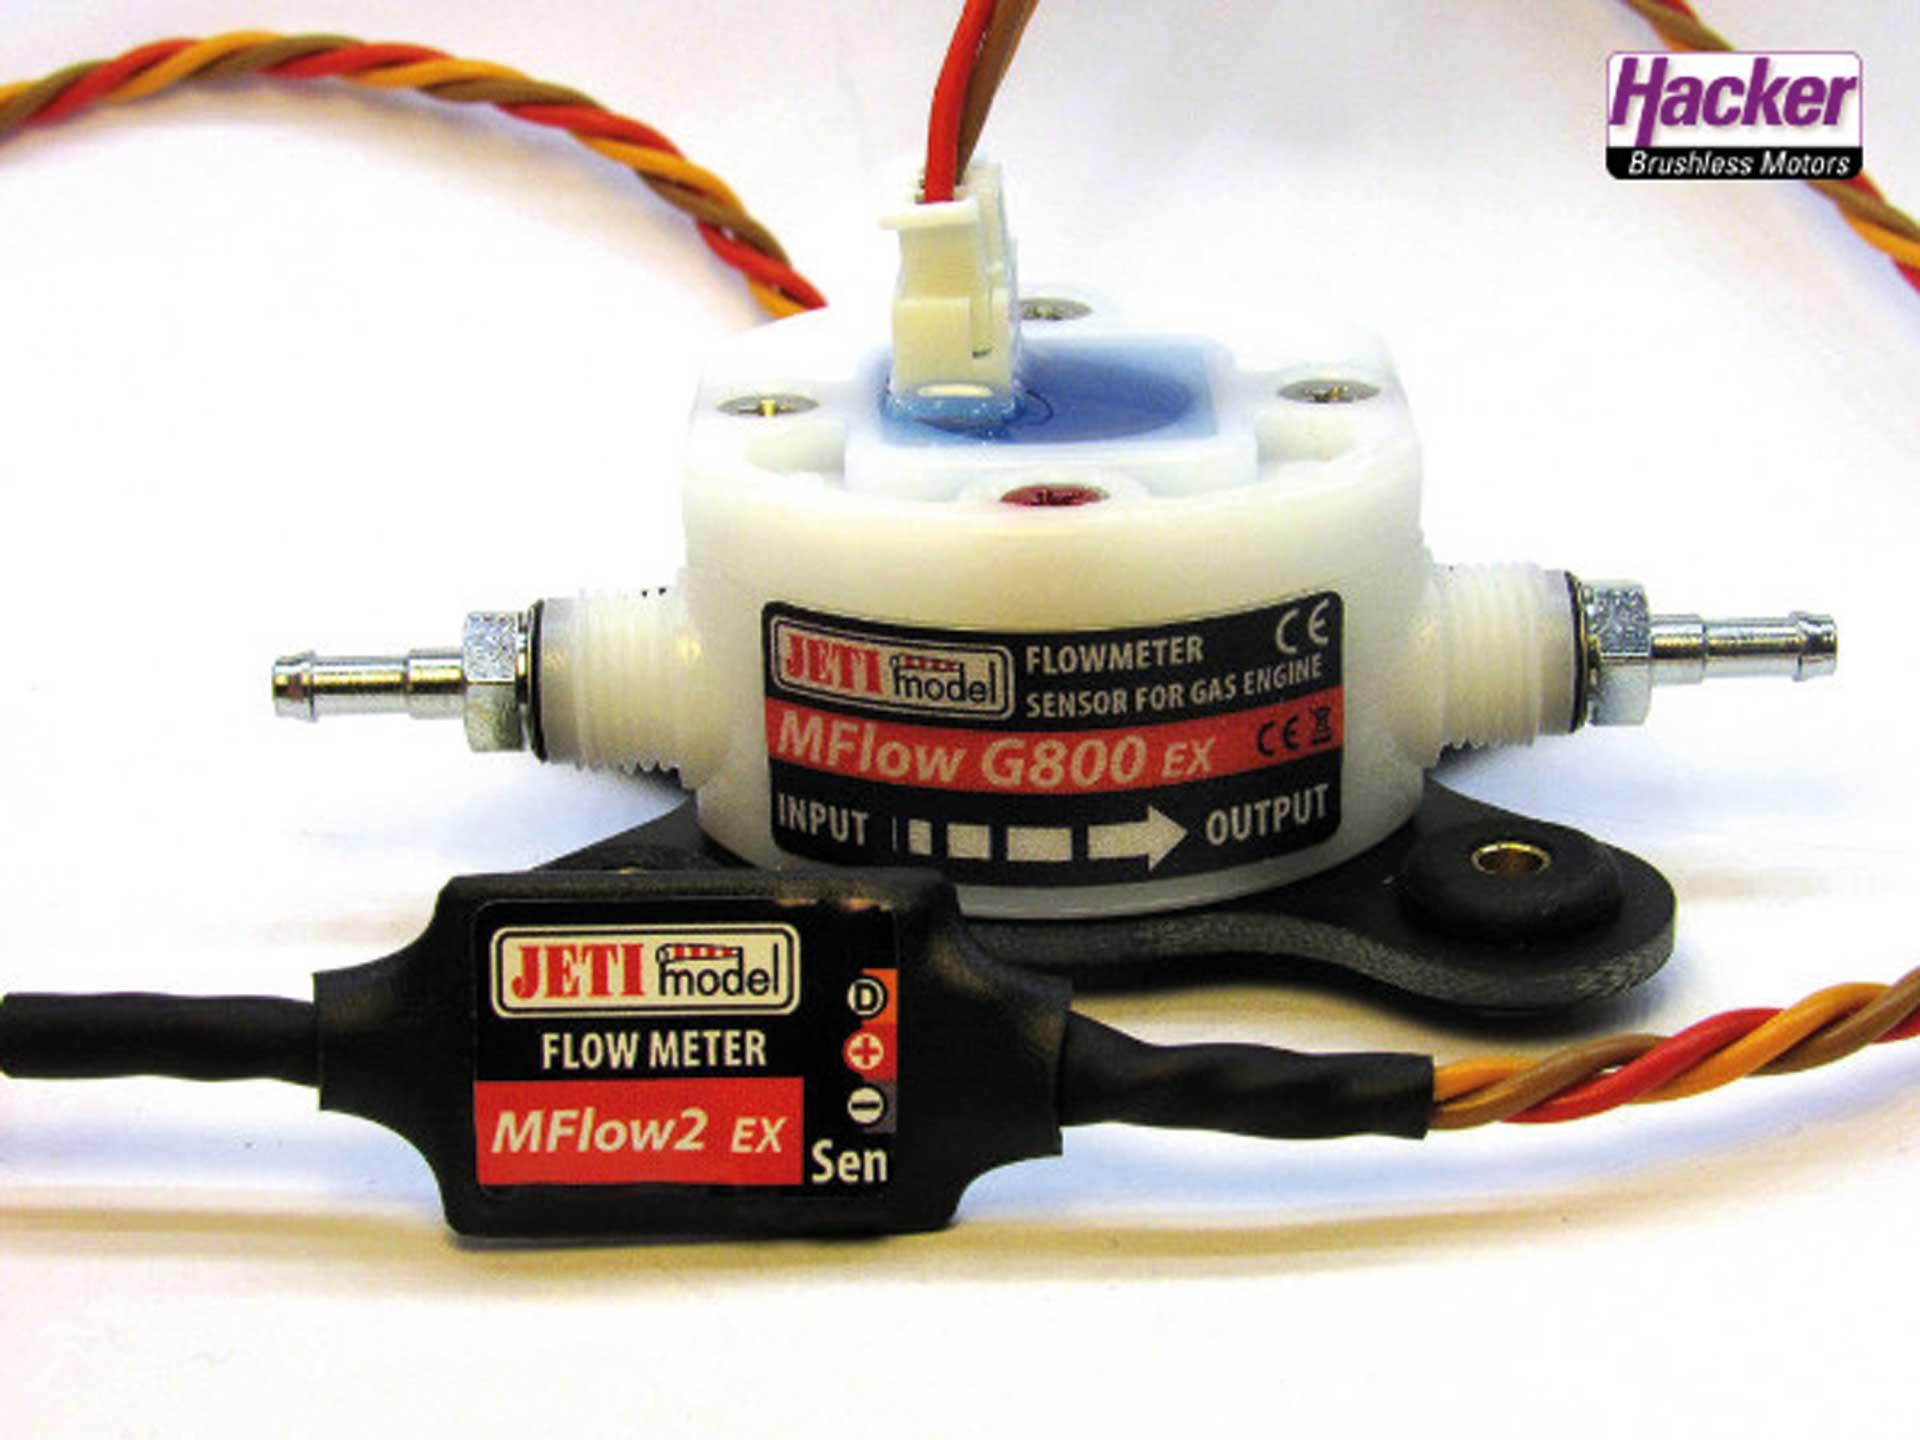 JETI DUPLEX 2.4EX MFlow2 Gas 800